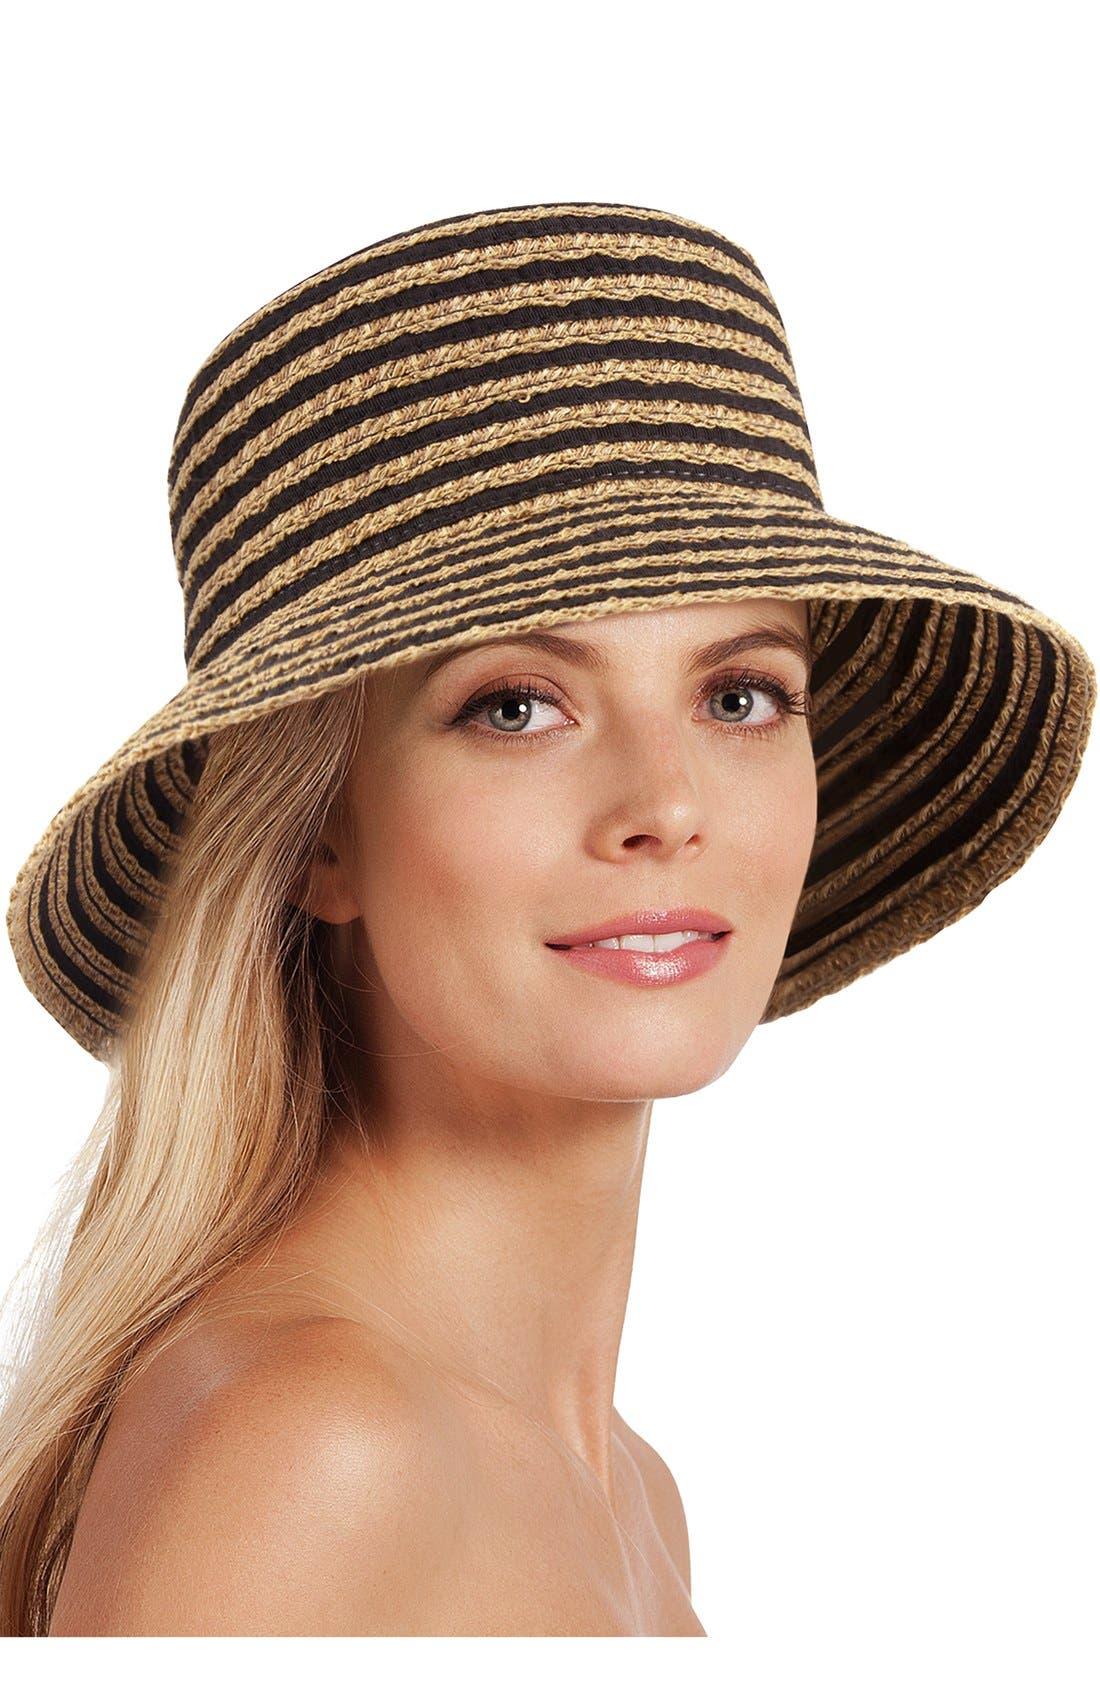 'Braid Dame' Hat,                             Alternate thumbnail 2, color,                             Black Mix